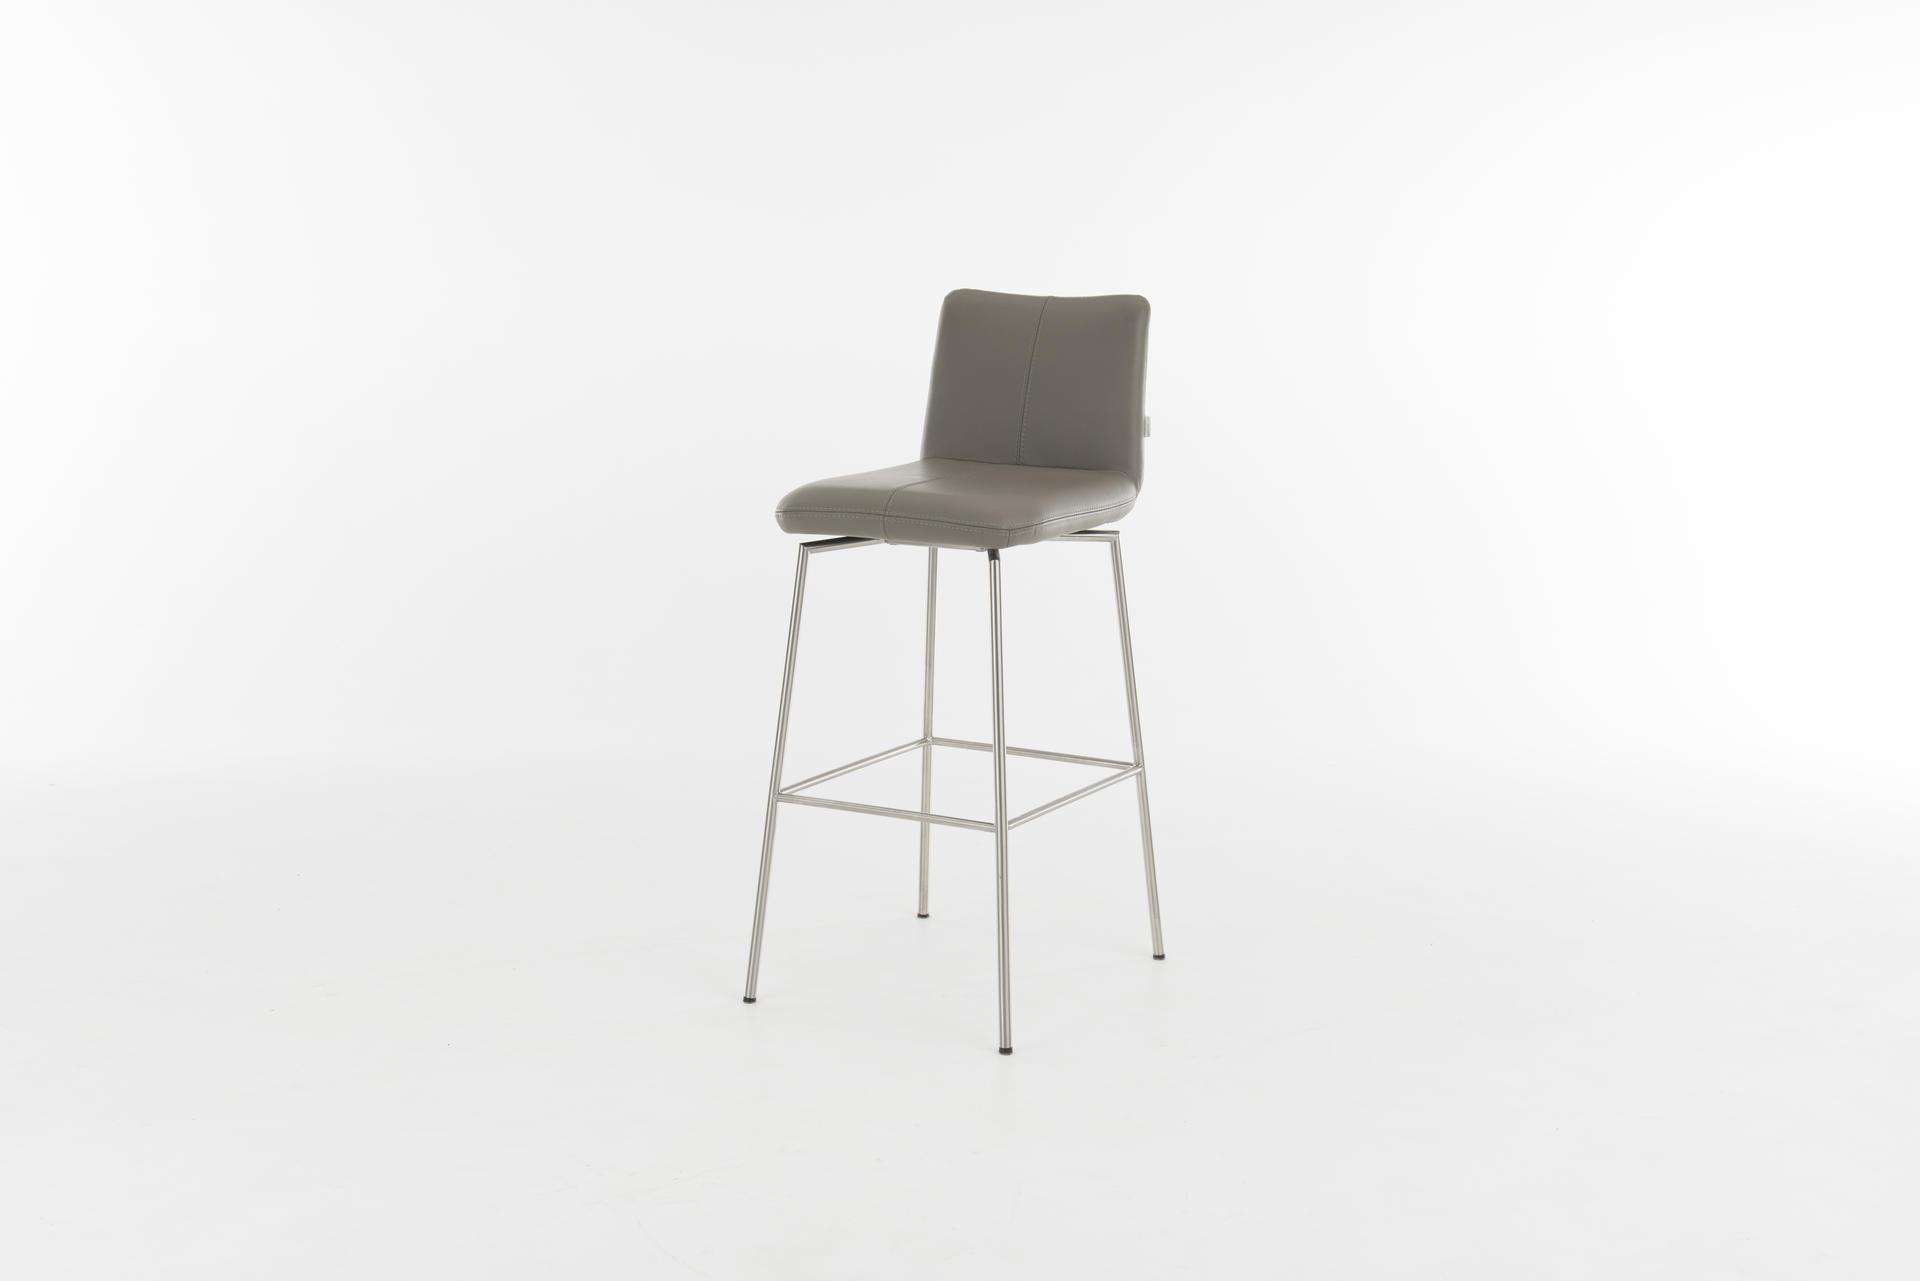 барный стул Hopper, Bert Plantagie